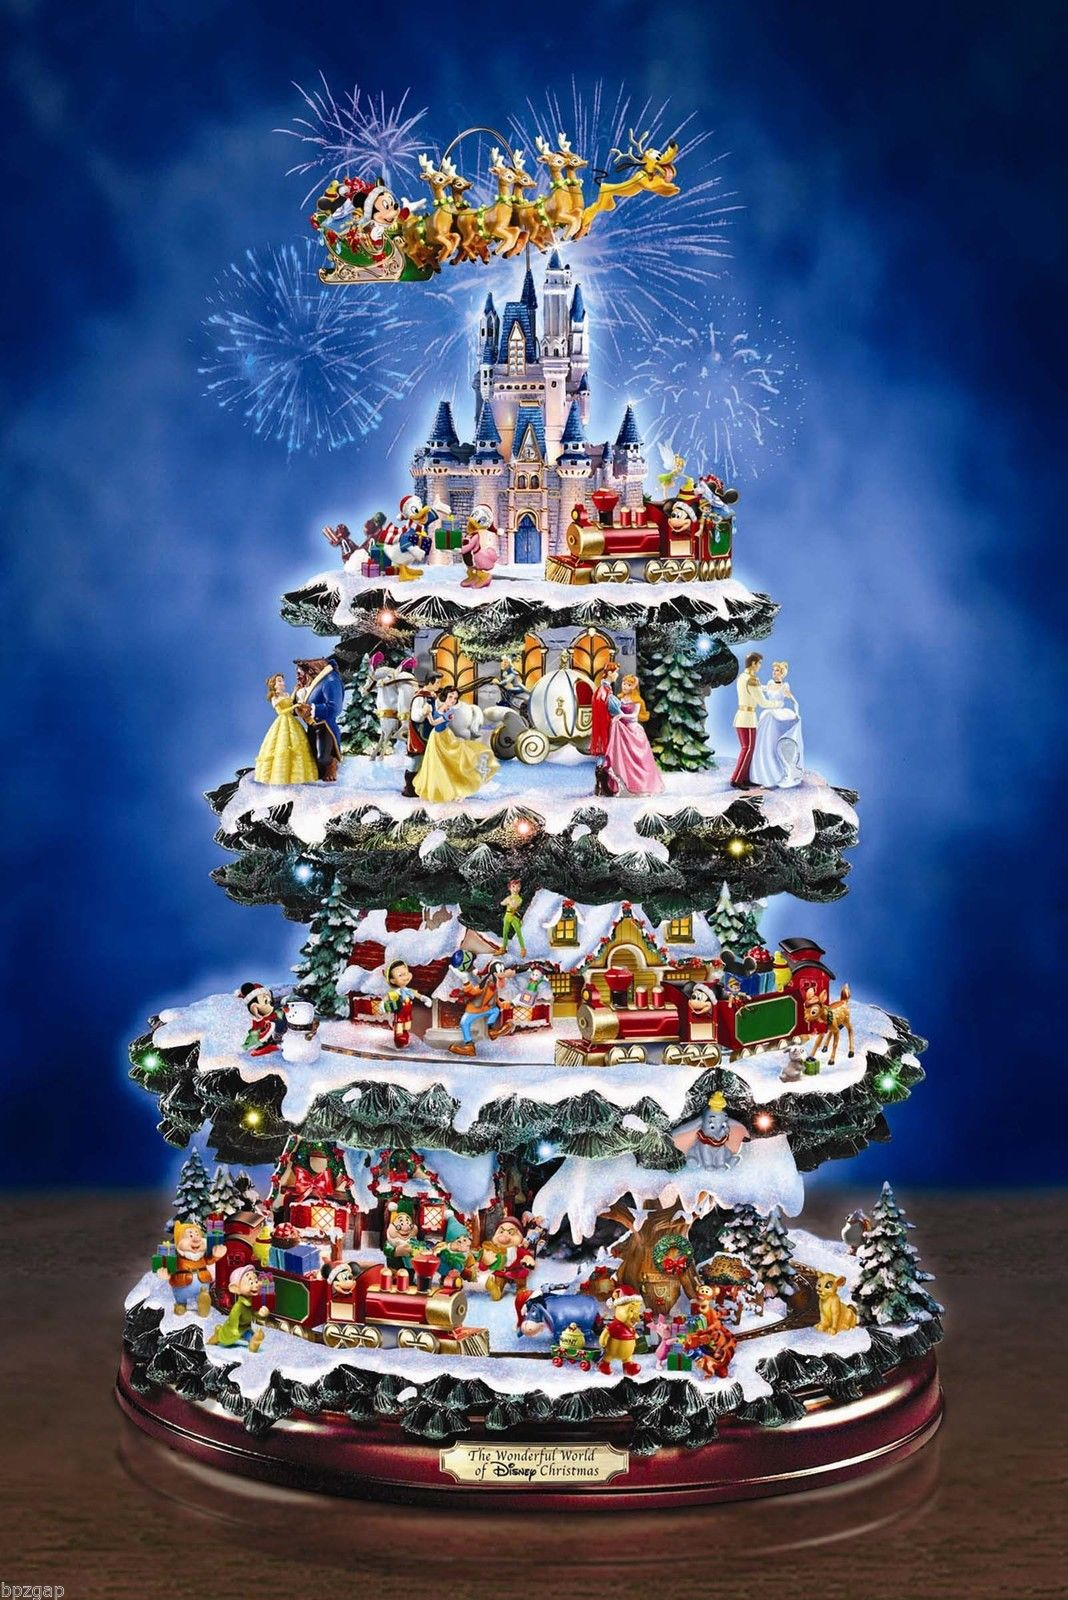 Disney The Wonderful World Of Disney Christmas Bradford